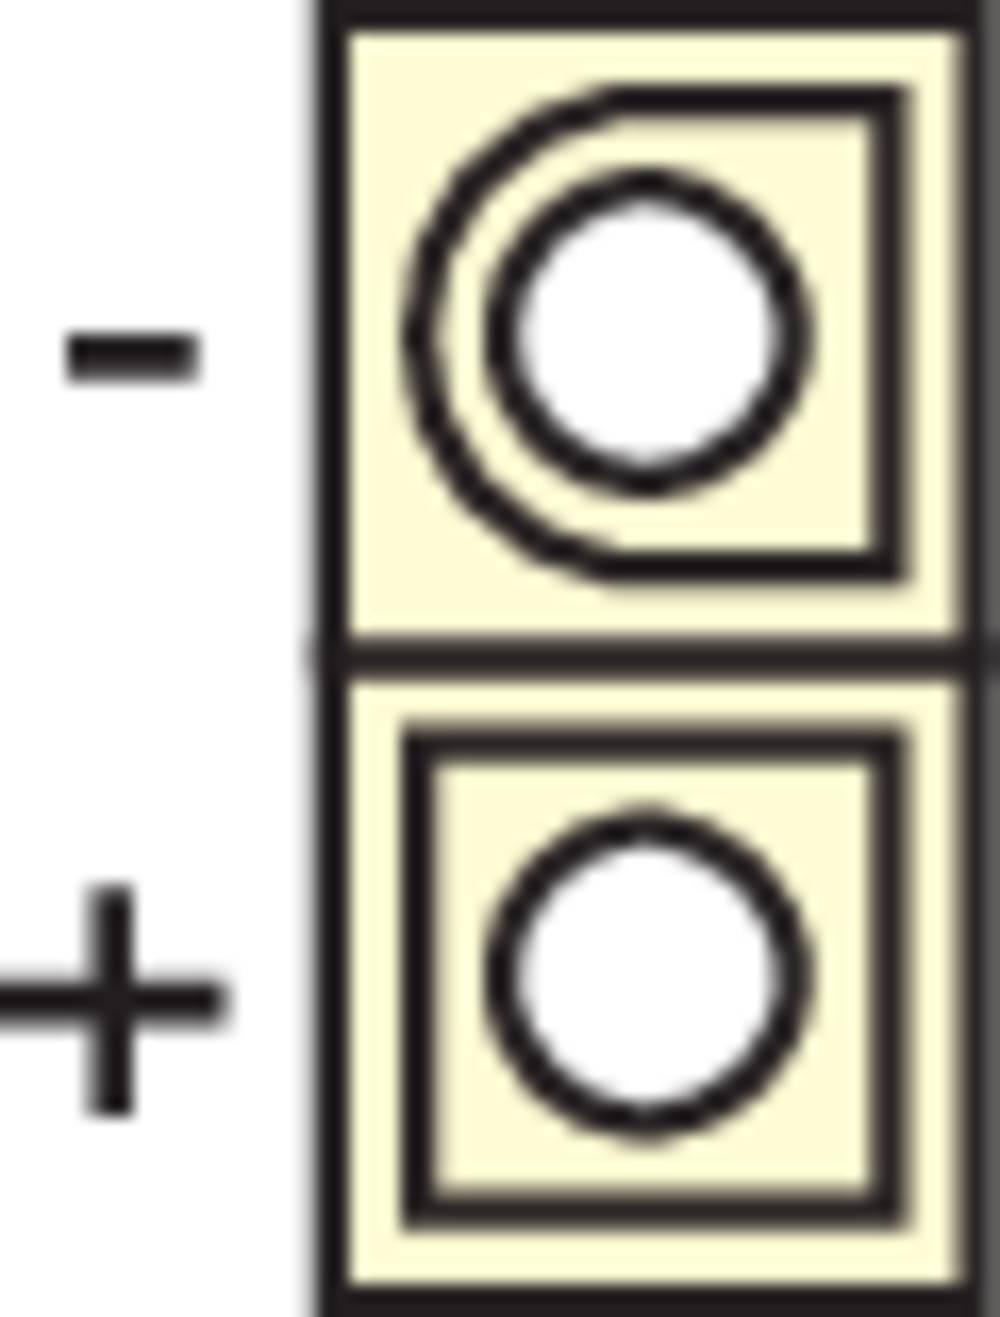 Modelcraft-Adapterkabel-1x-Tamiya-Stecker-1x-Micro-Car-Stecker Indexbild 3